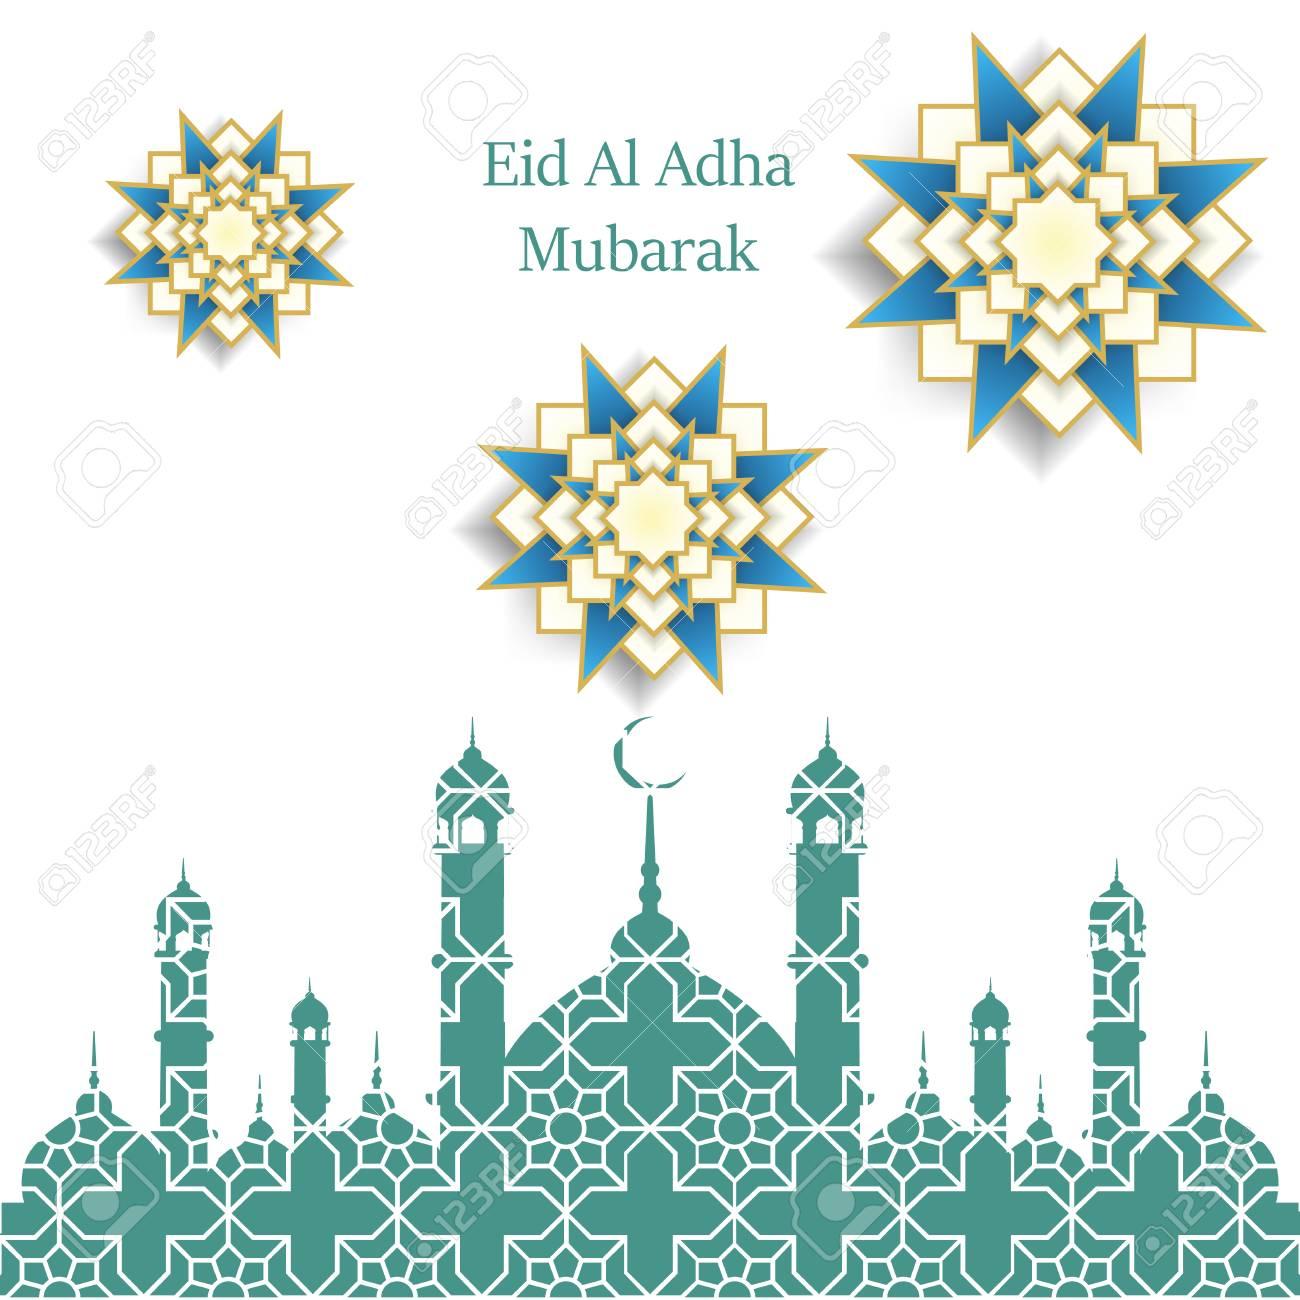 Islamic Festival Of Sacrifice, Eid Al Adha Mubarak Greeting Card ...